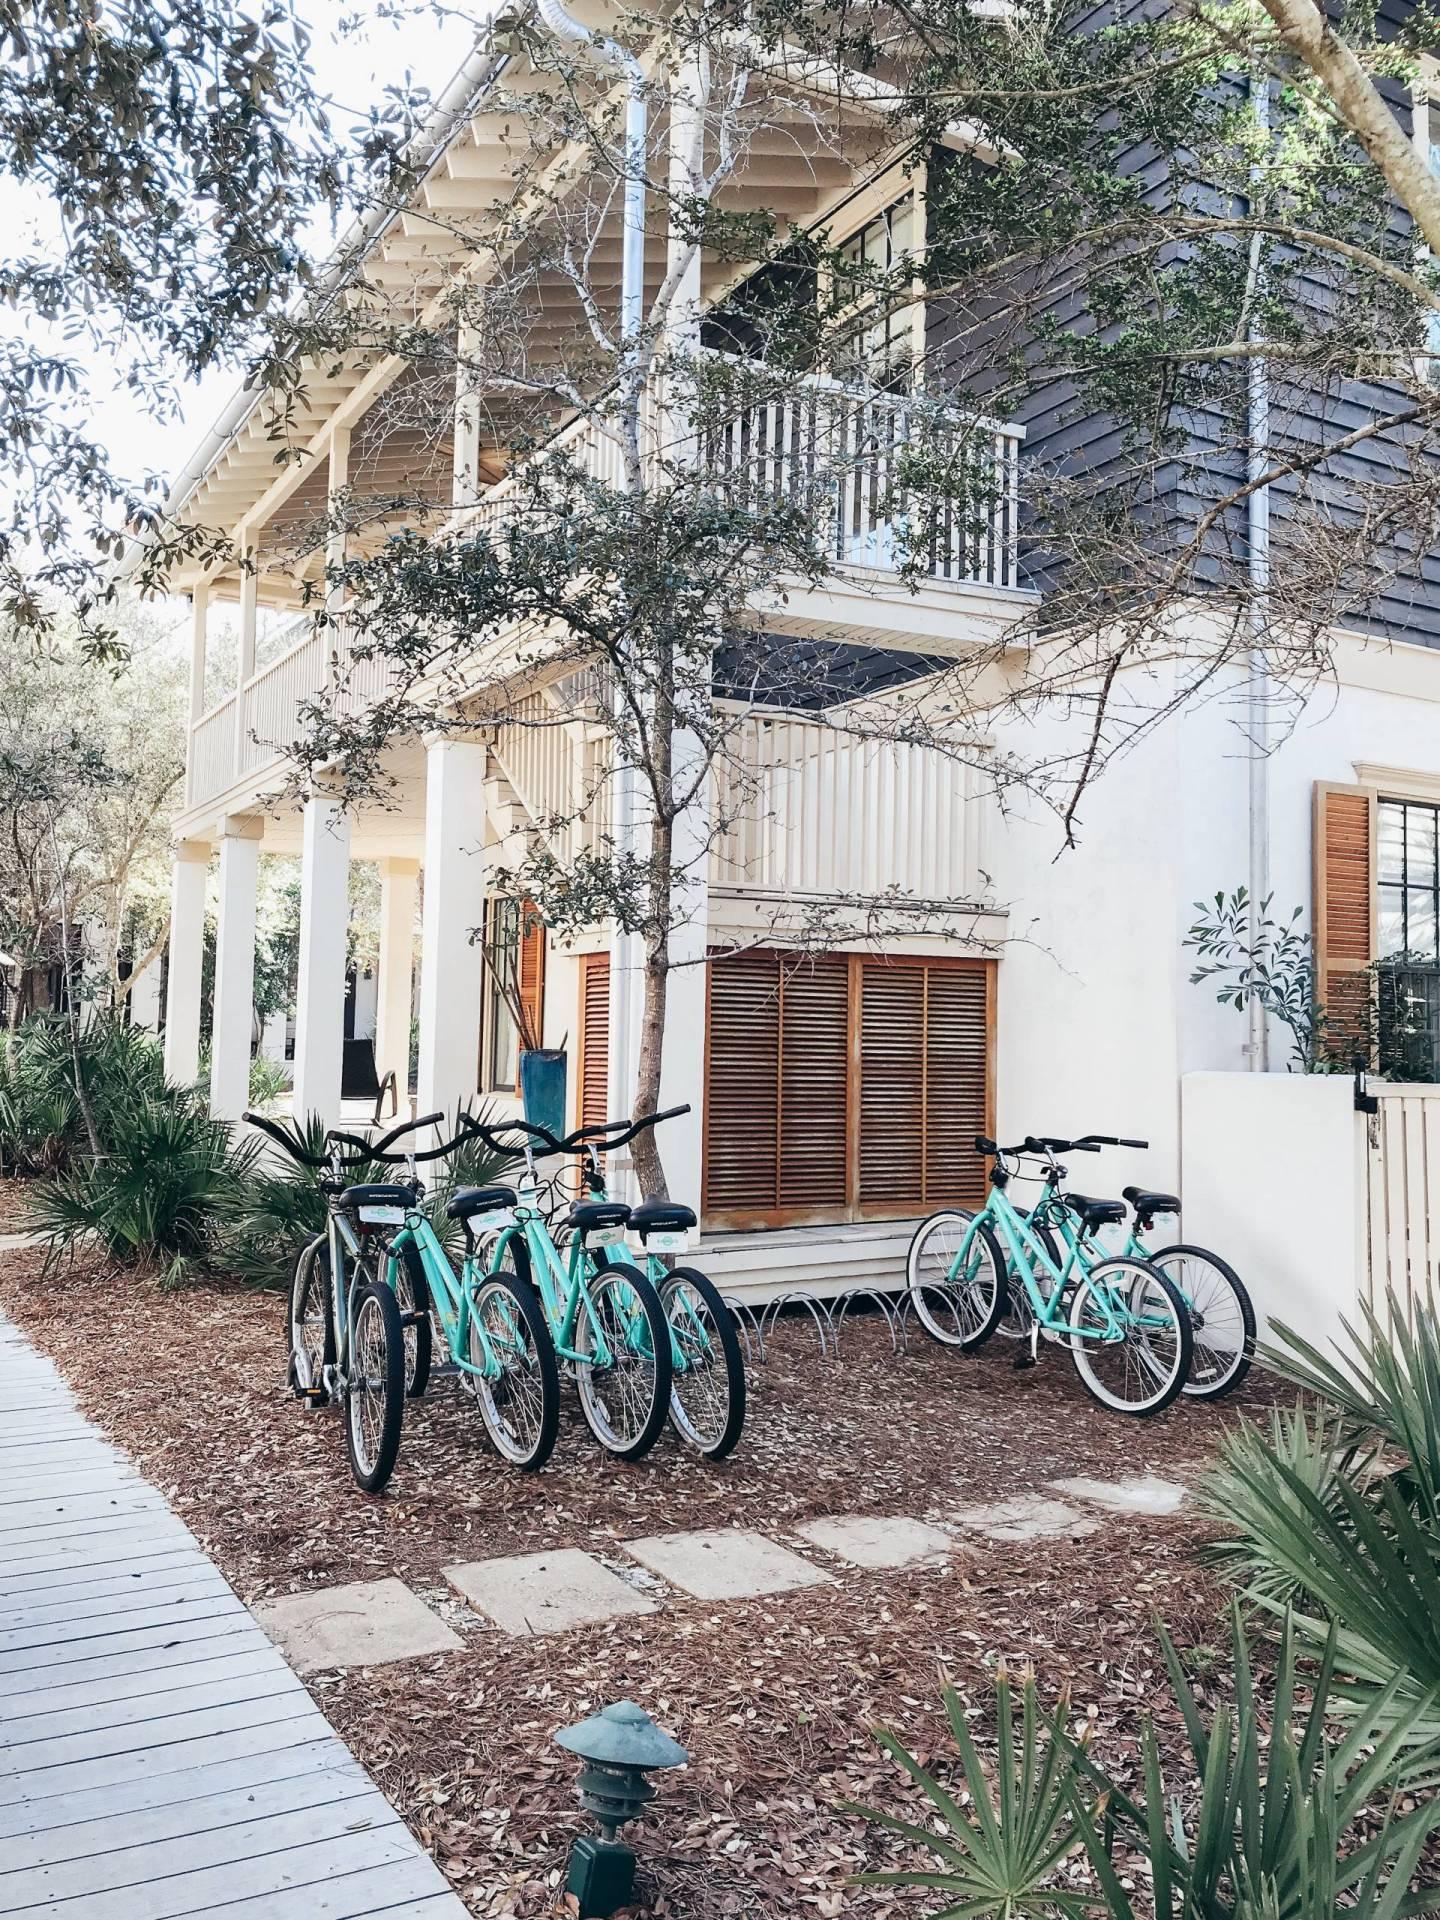 Bike Riding in Rosemary Beach 30A Florida